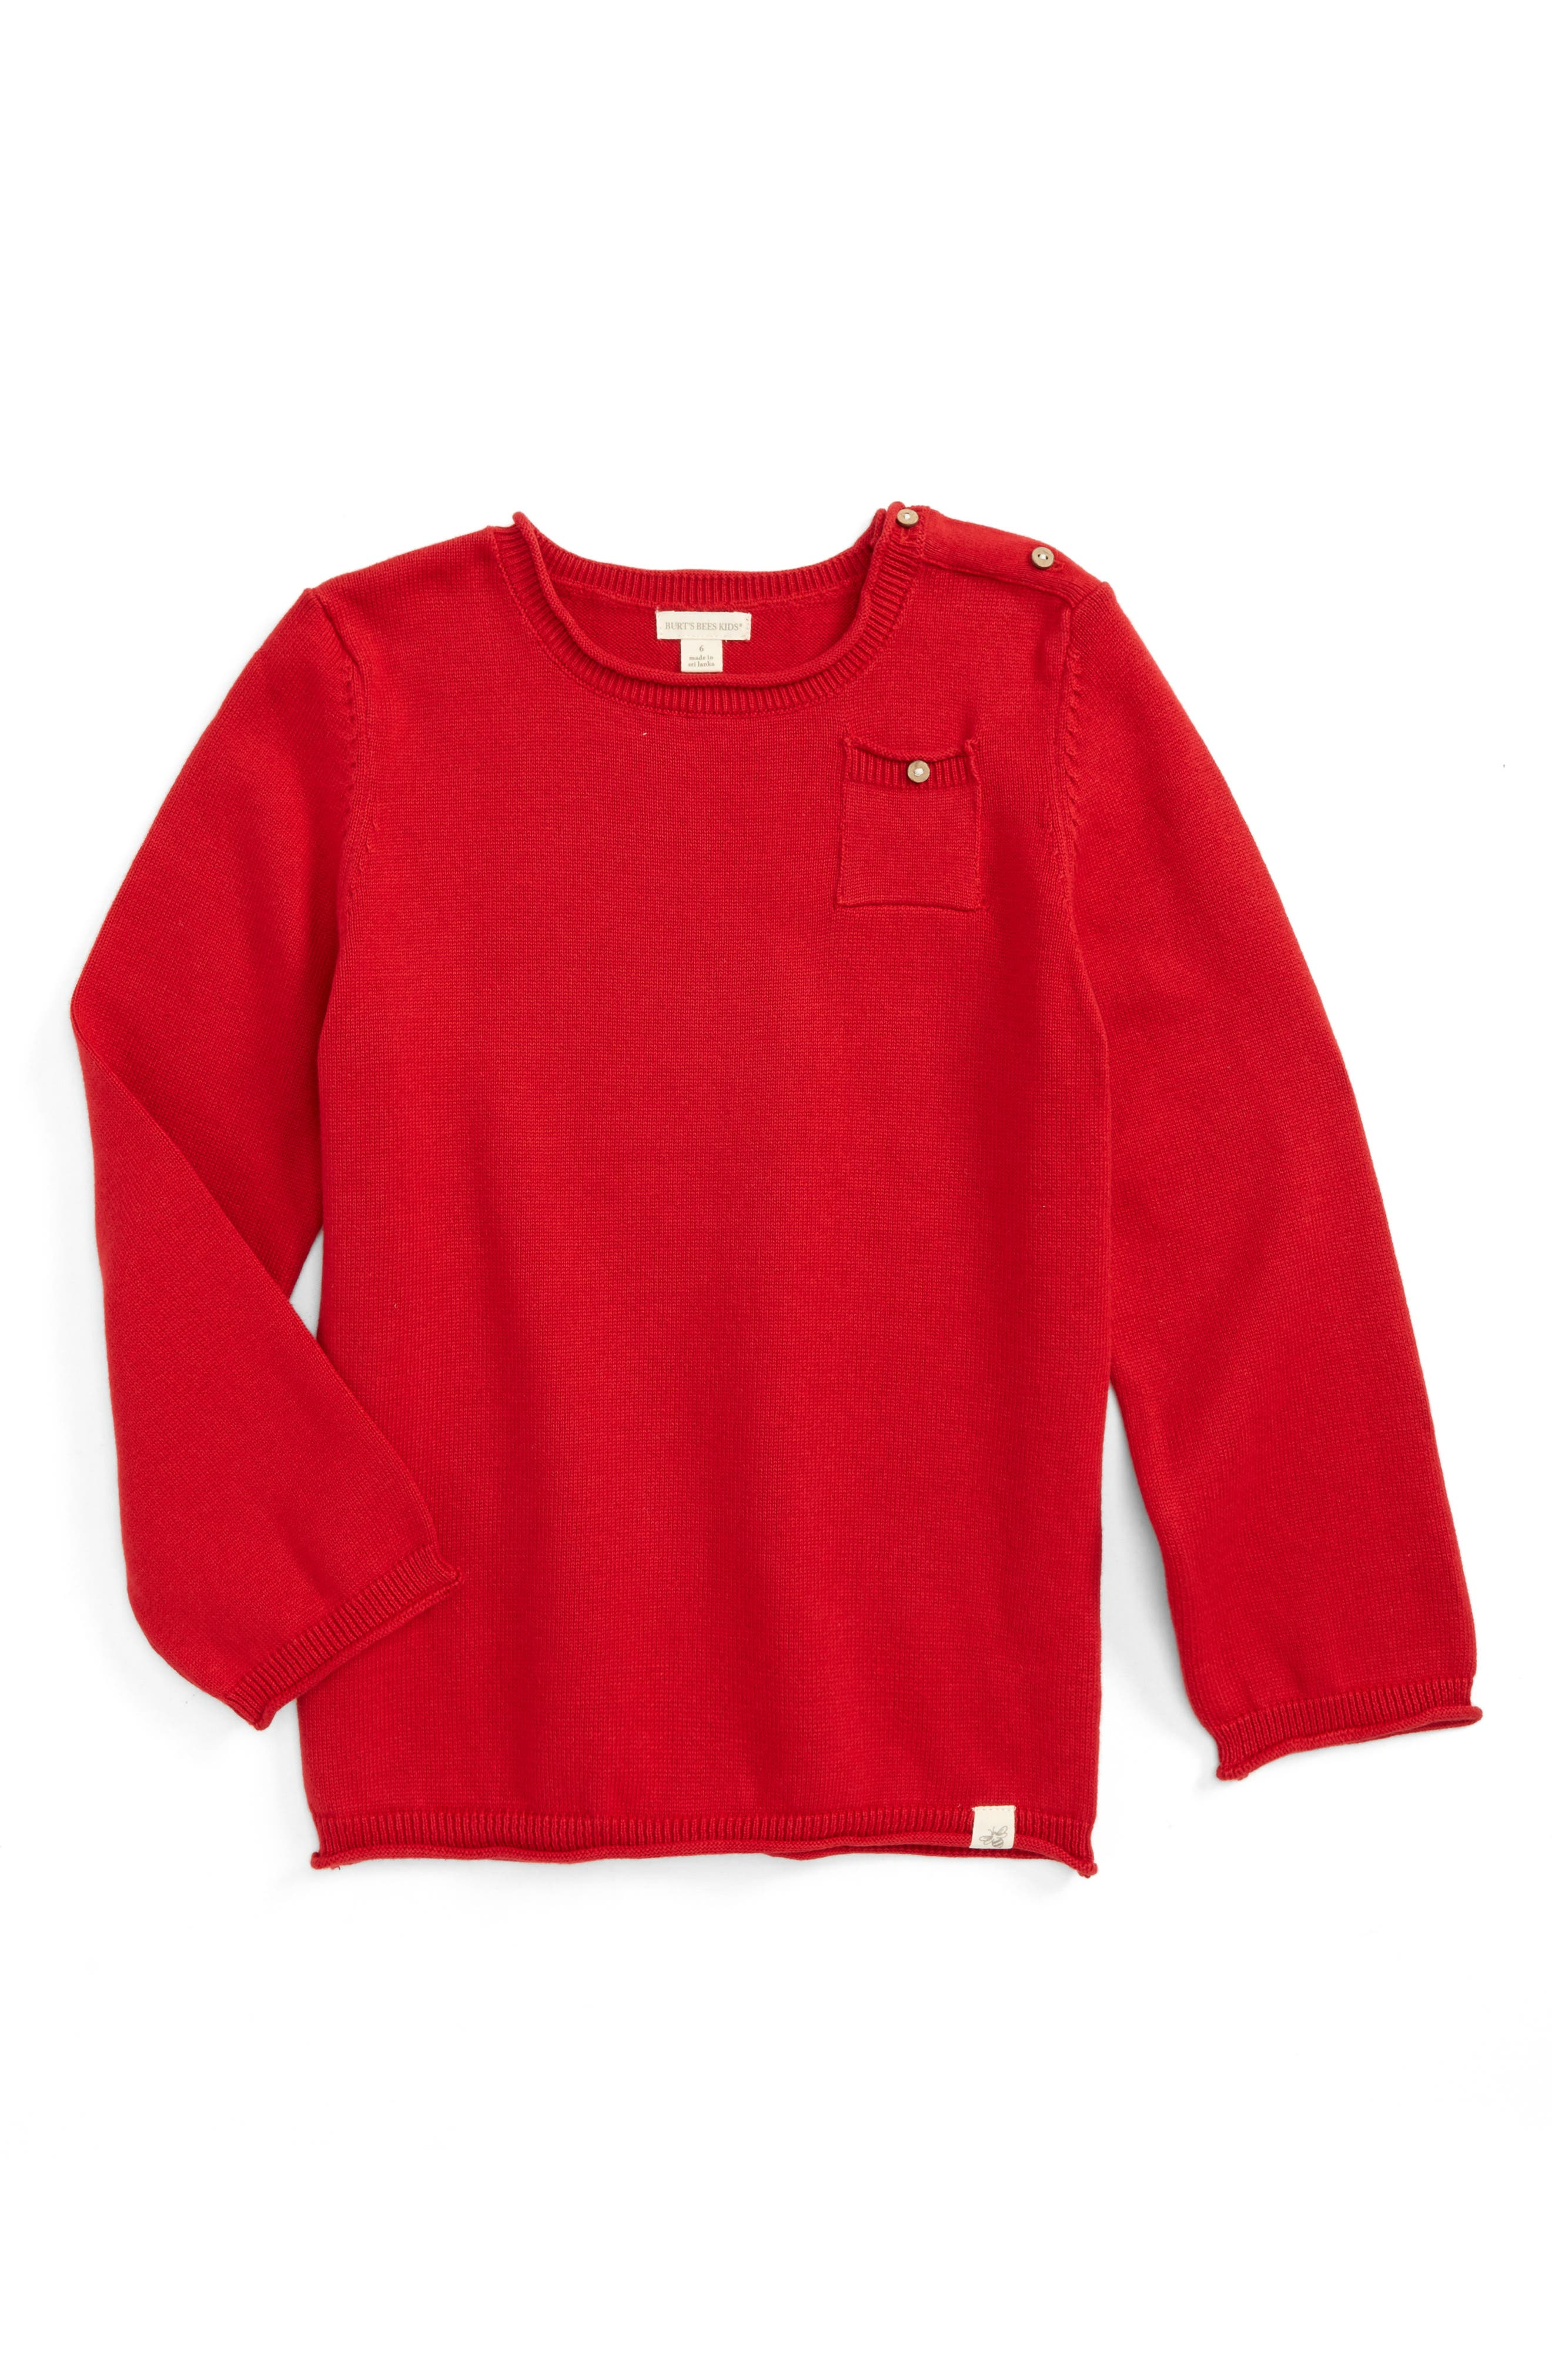 Alternate Image 1 Selected - Burt's Bees Baby Pocket Organic Cotton Sweater (Toddler Boys & Big Boys)